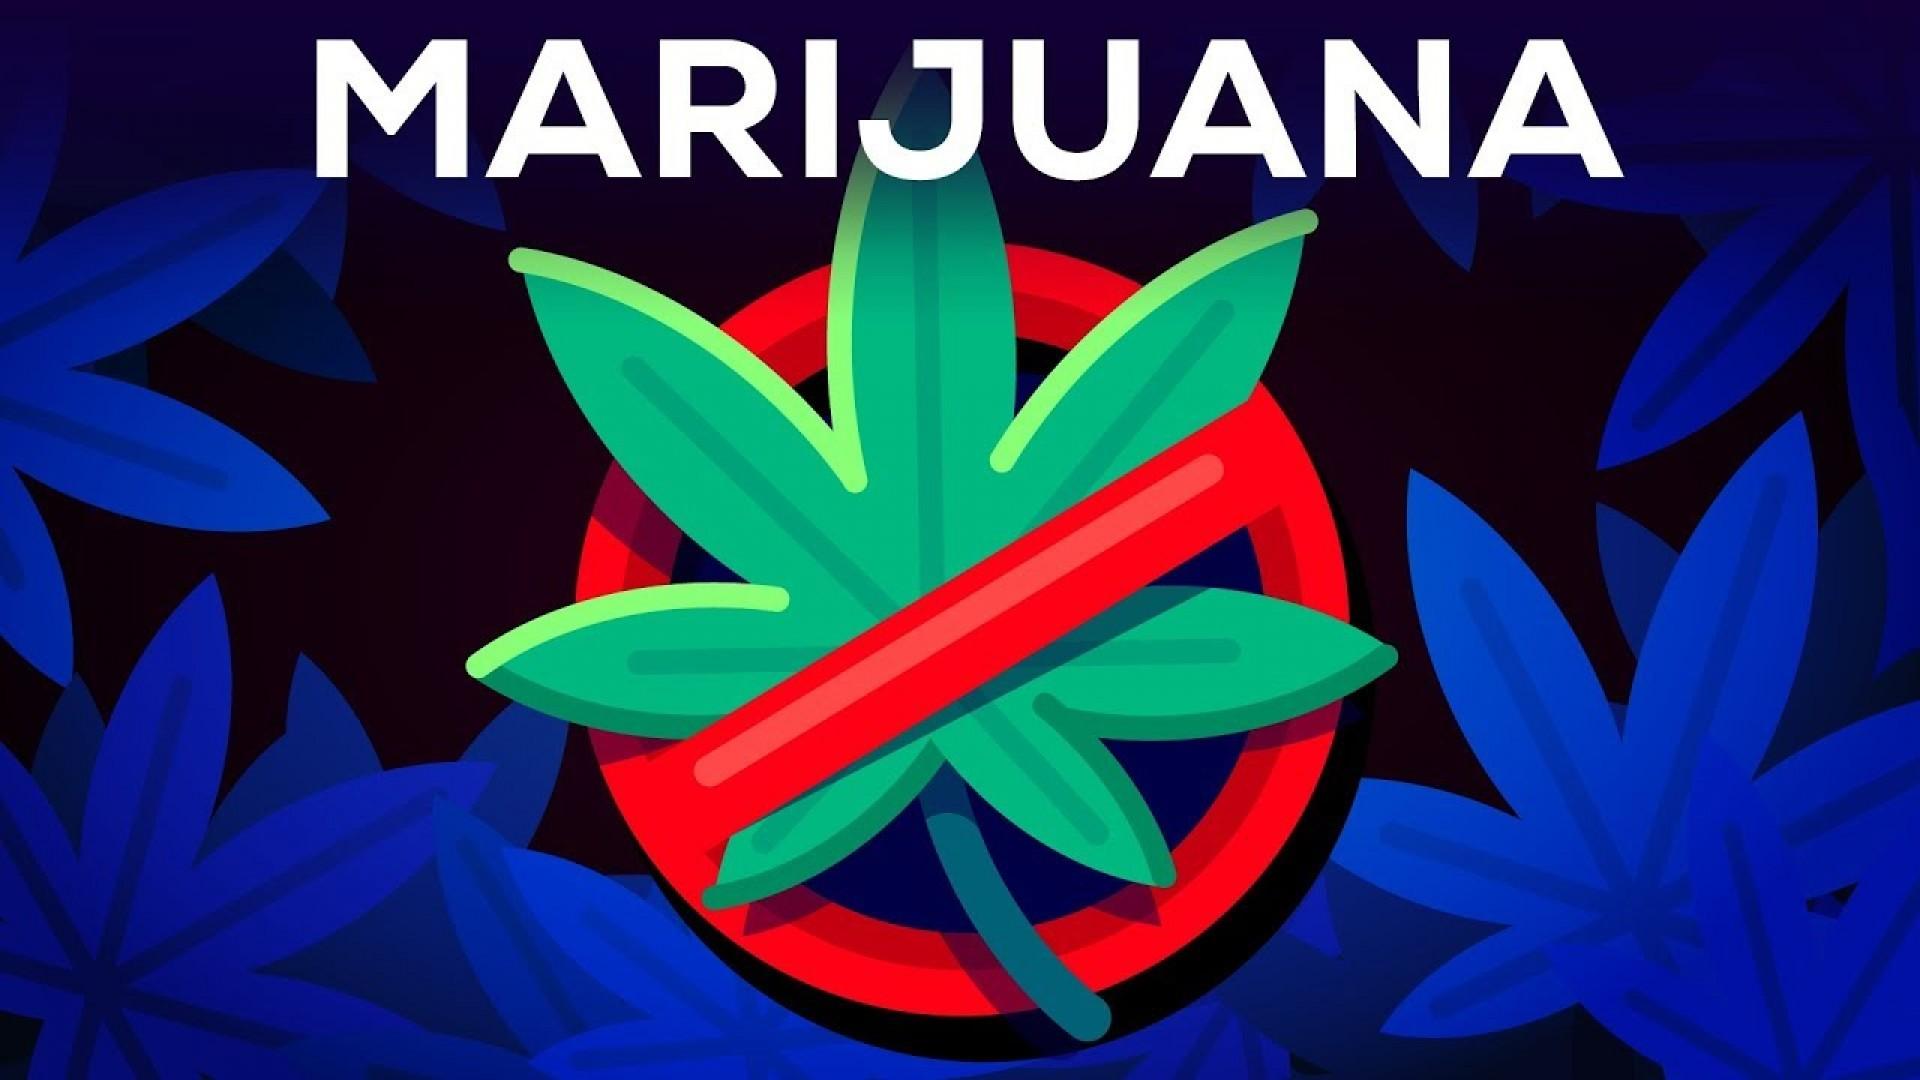 012 Why Marijuanas Should Illegal Essay Example Frightening Be Medical Argumentative 1920